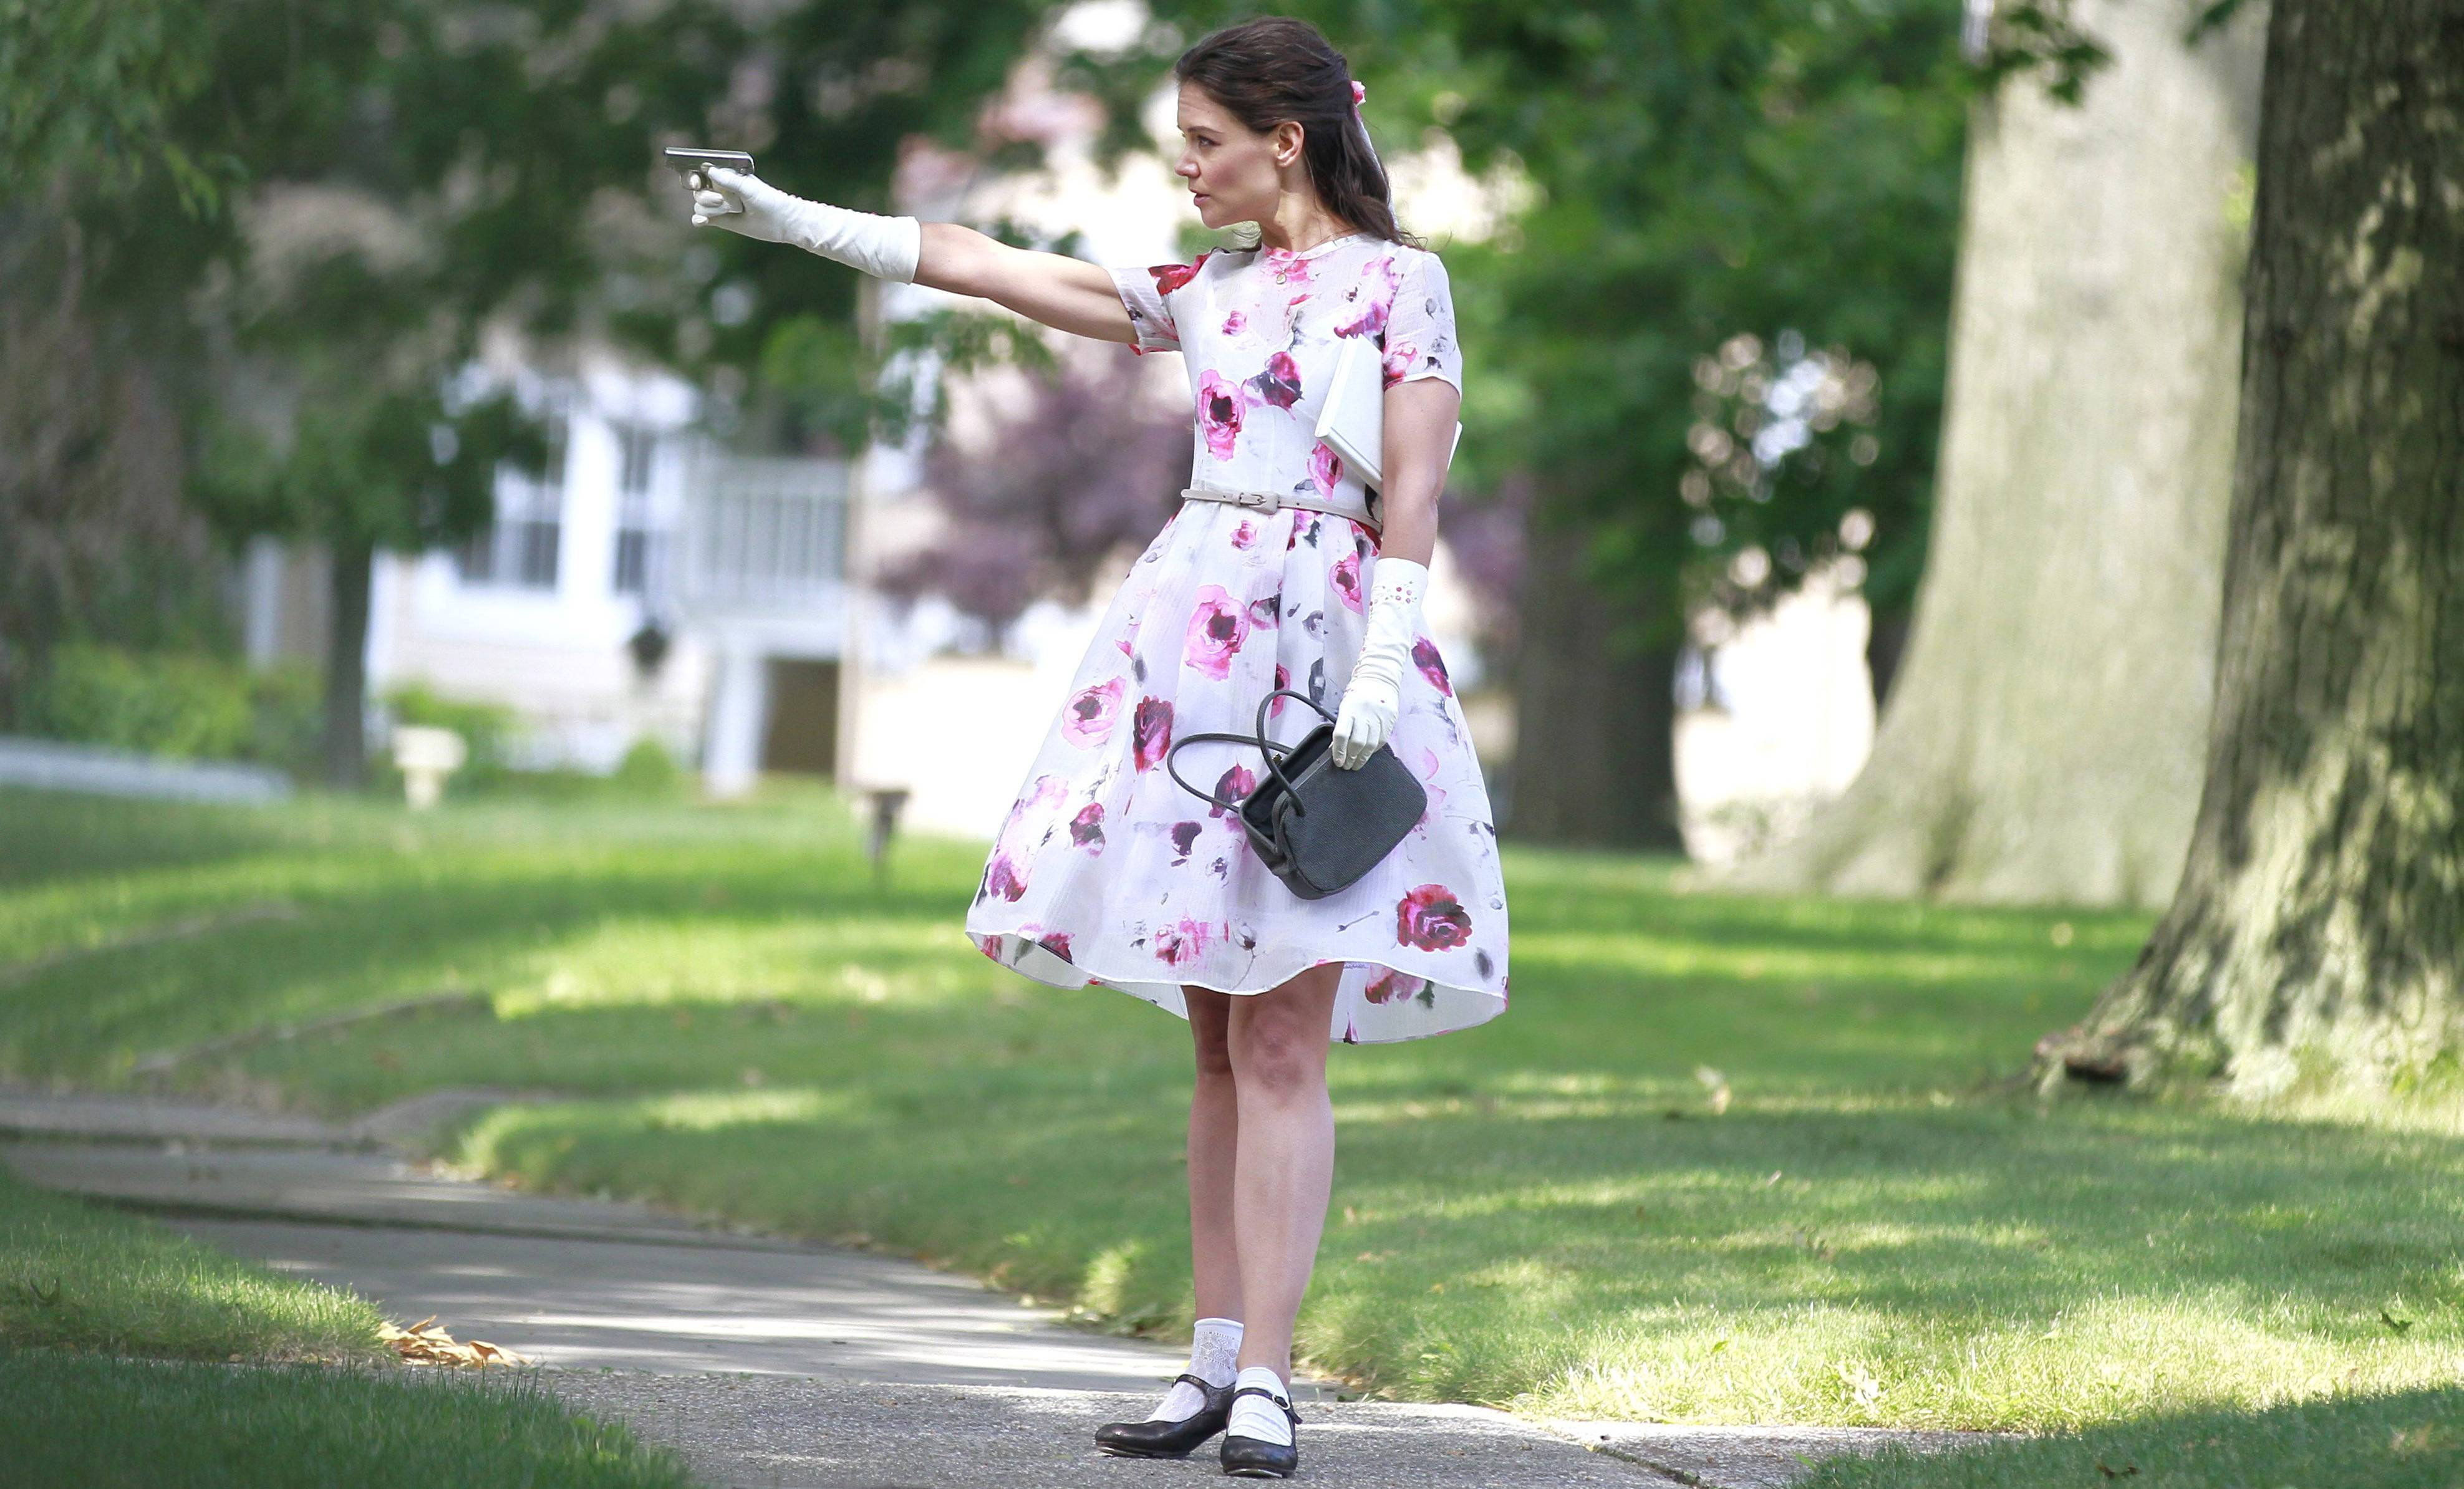 Miss Meadows, Katie Holmes diventa insegnante modello con pistola